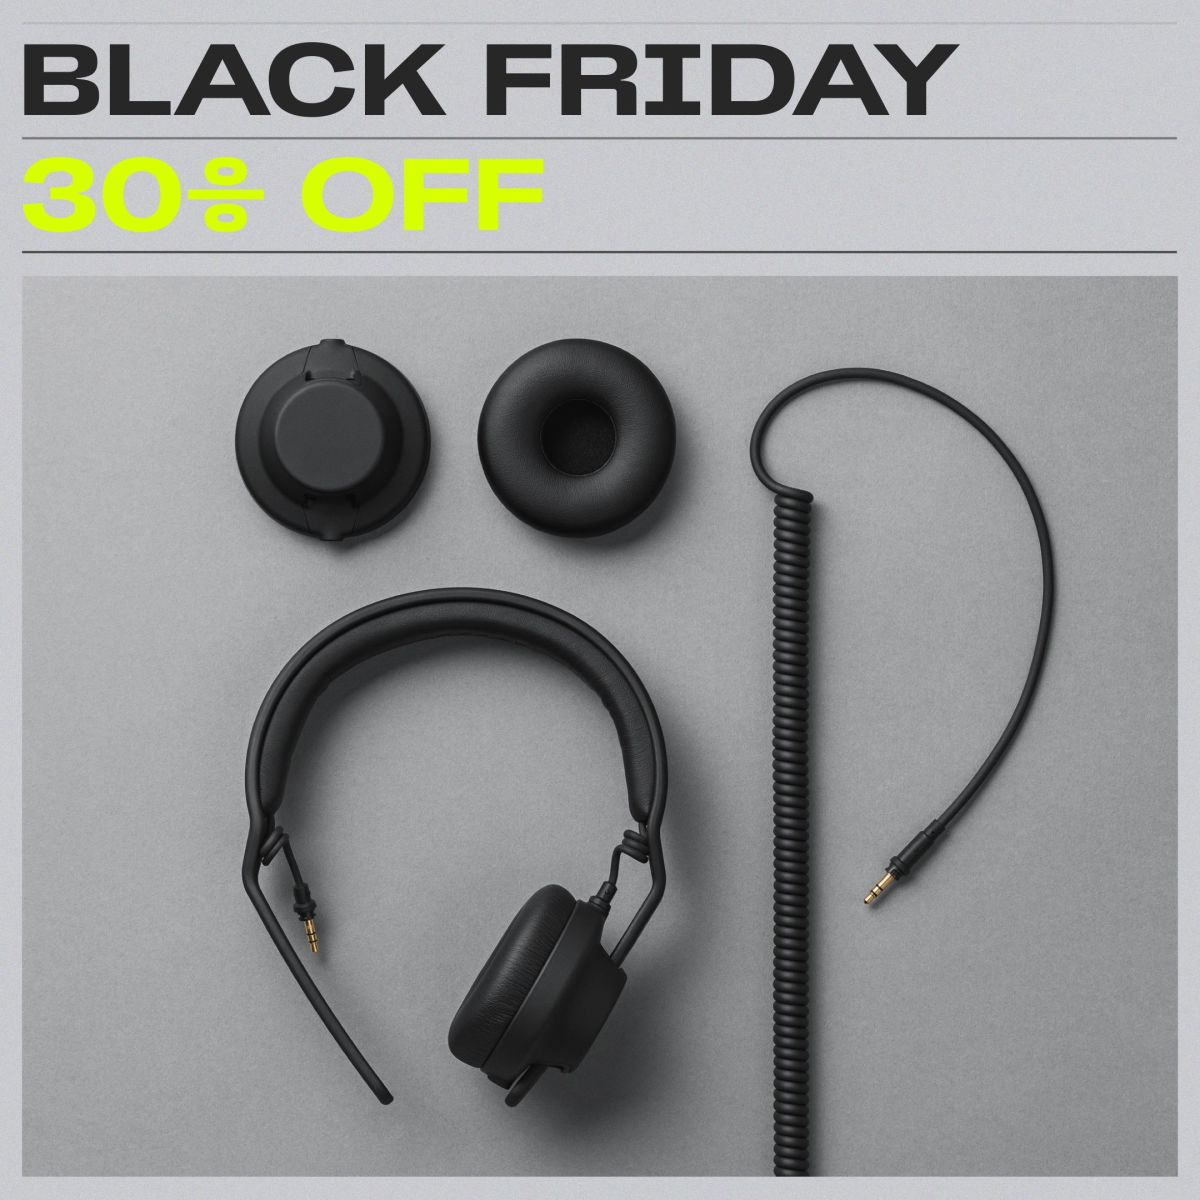 AIAIAI Black Friday